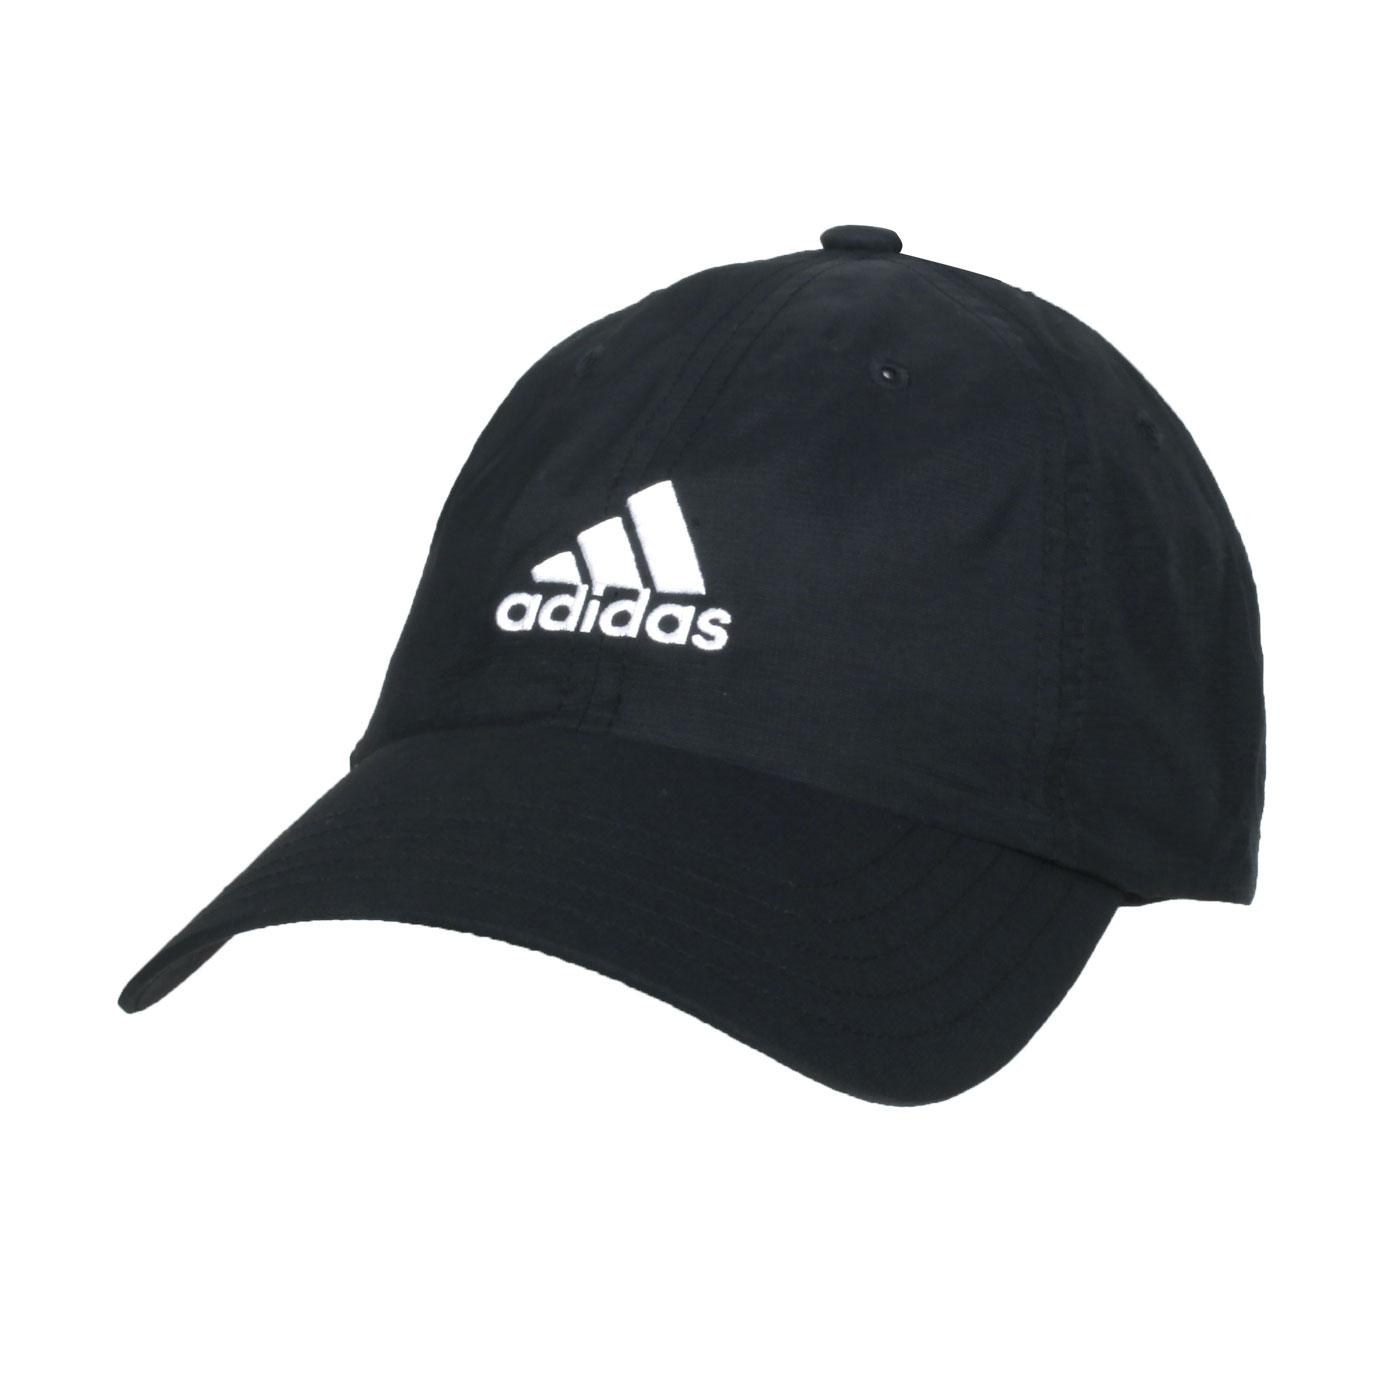 ADIDAS 帽子 FS9007 - 黑白